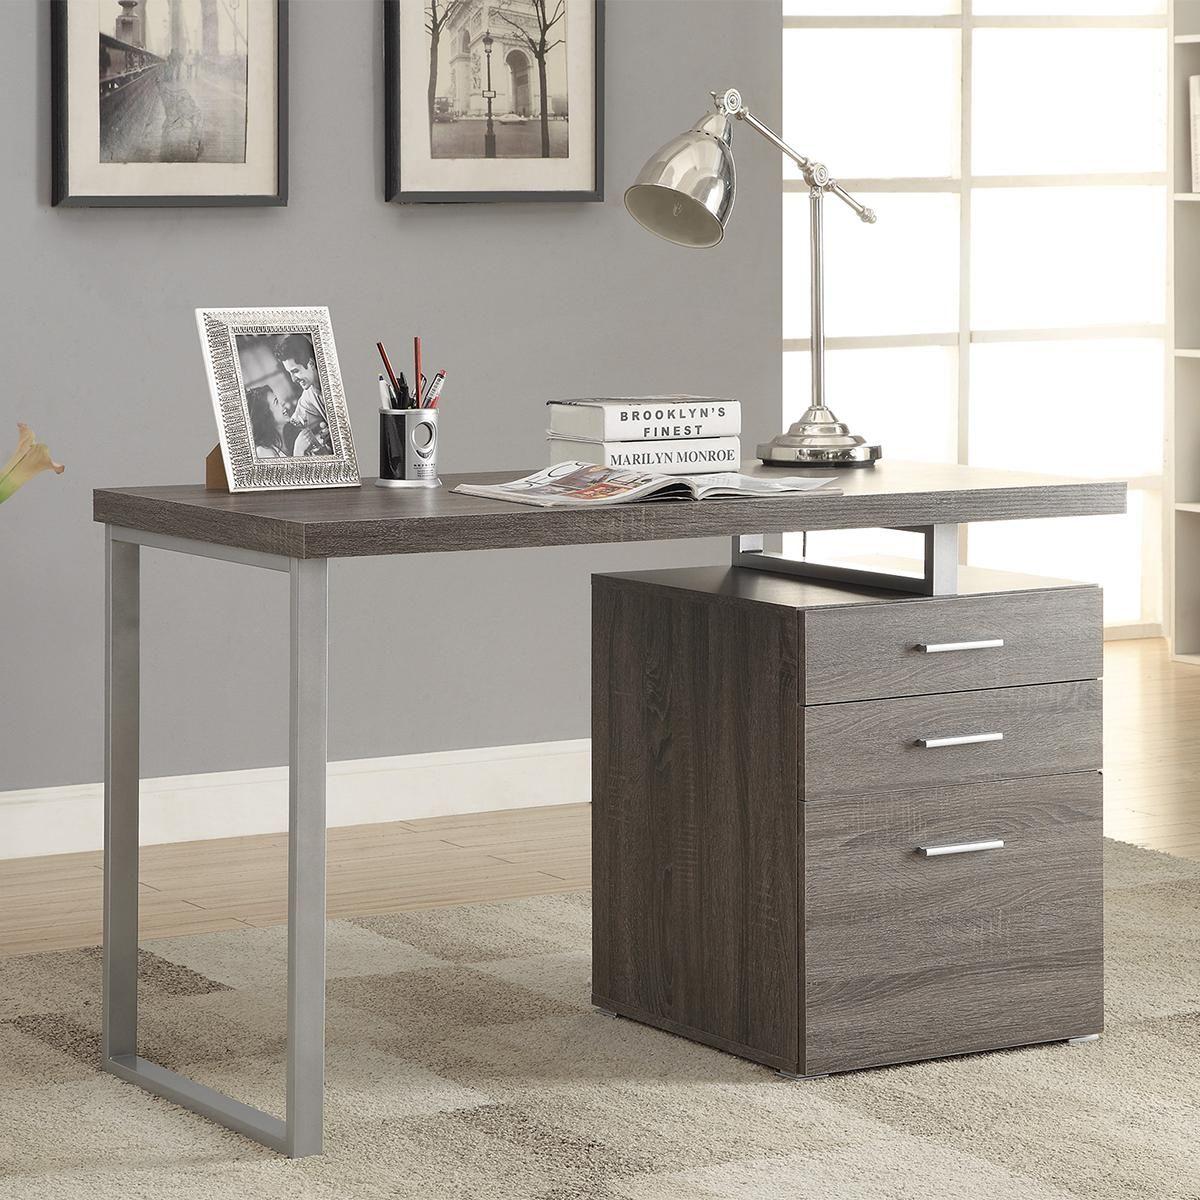 Pacific Landing Hilliard Writing Desk With File Drawer In Weathered Grey Nebraska Furn Contemporary Office Desk Modern Home Office Desk Home Office Furniture